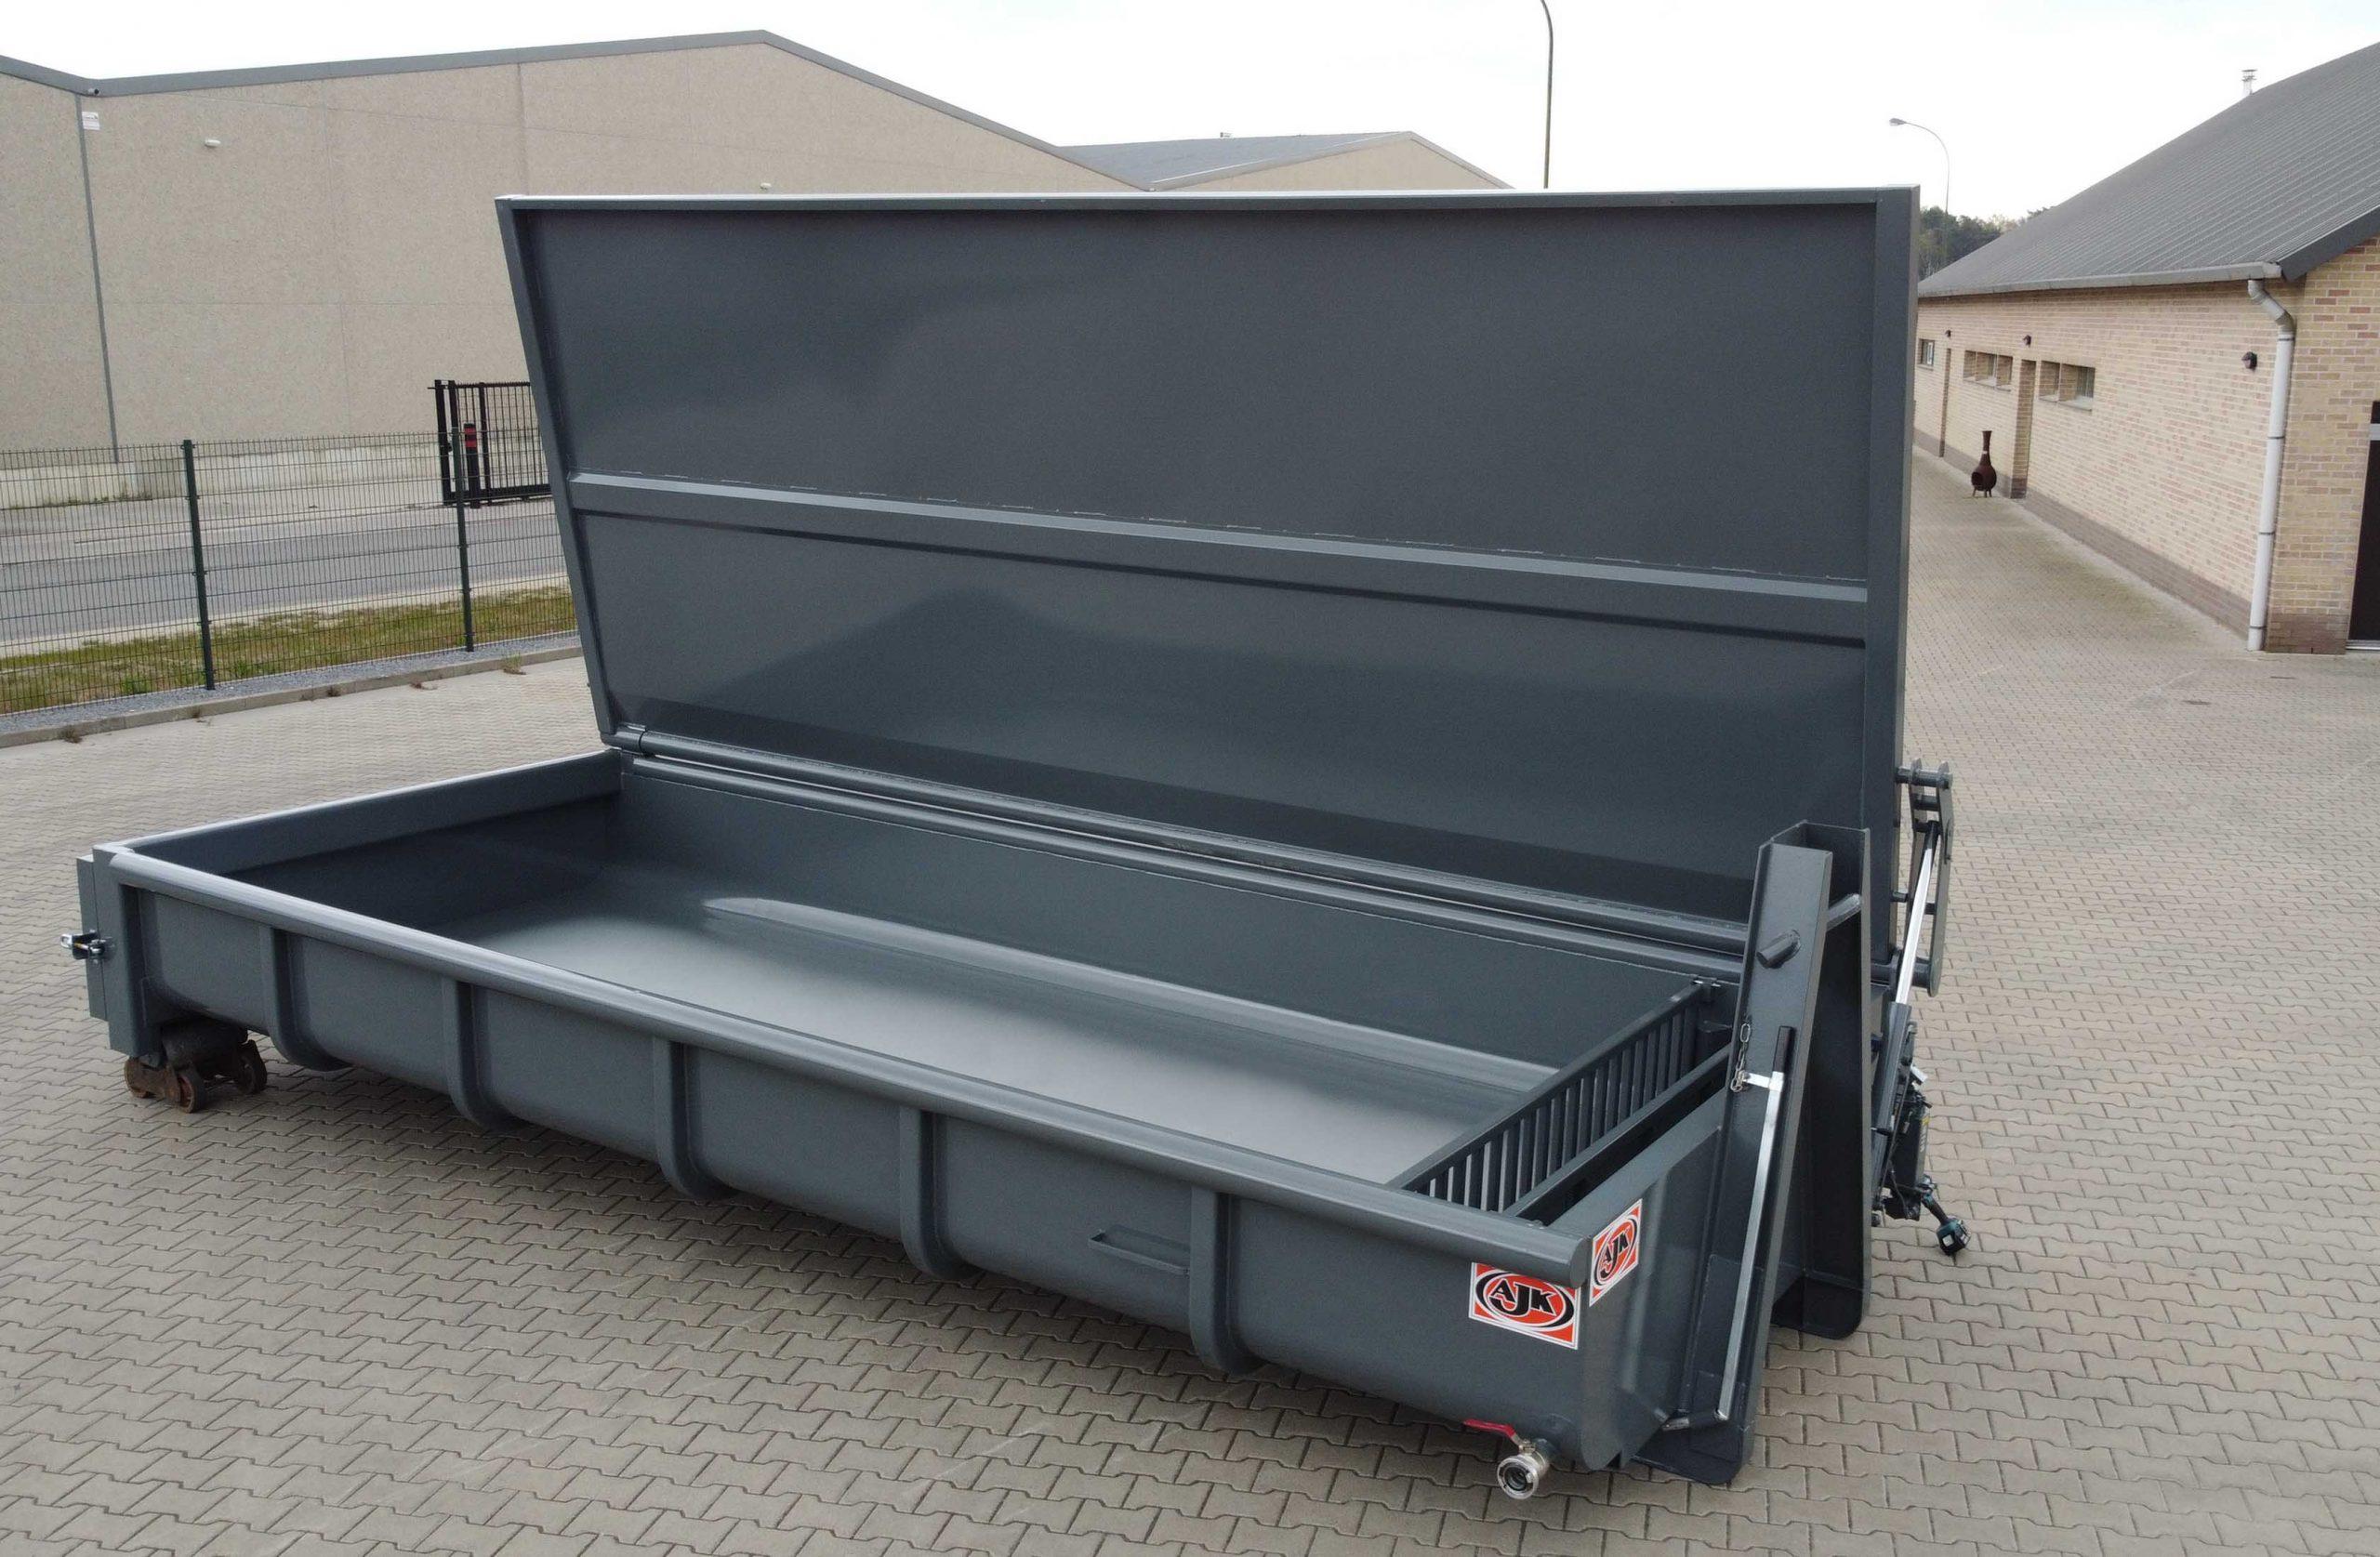 slib-wateropvang-container IDM -